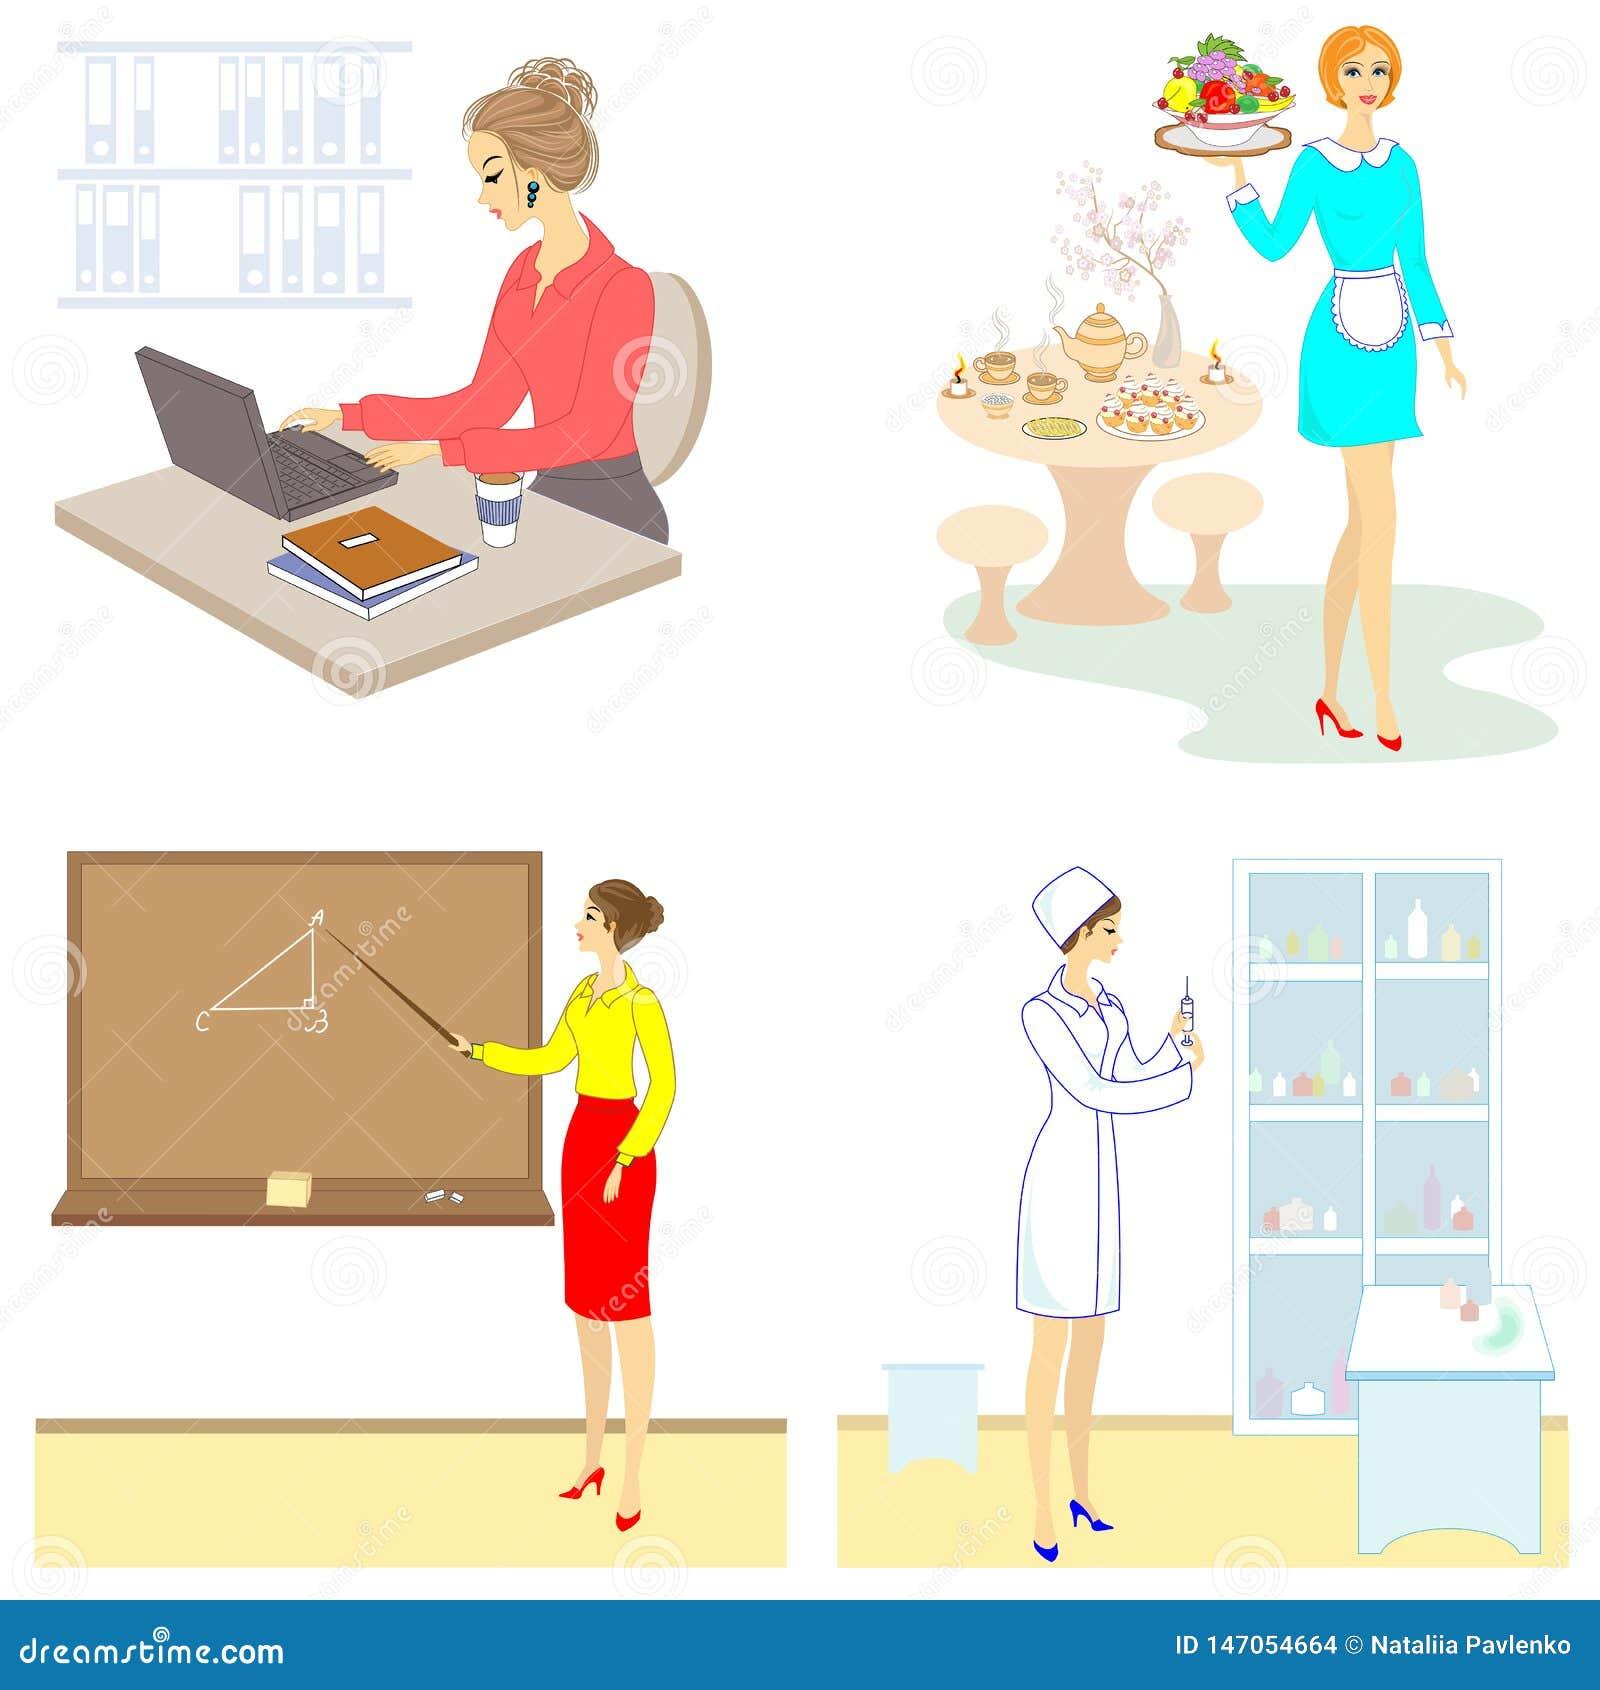 R Επαγγέλματα για μια κυρία Δάσκαλος γυναικών, νοσοκόμα, γραμματέας, σερβιτόρα